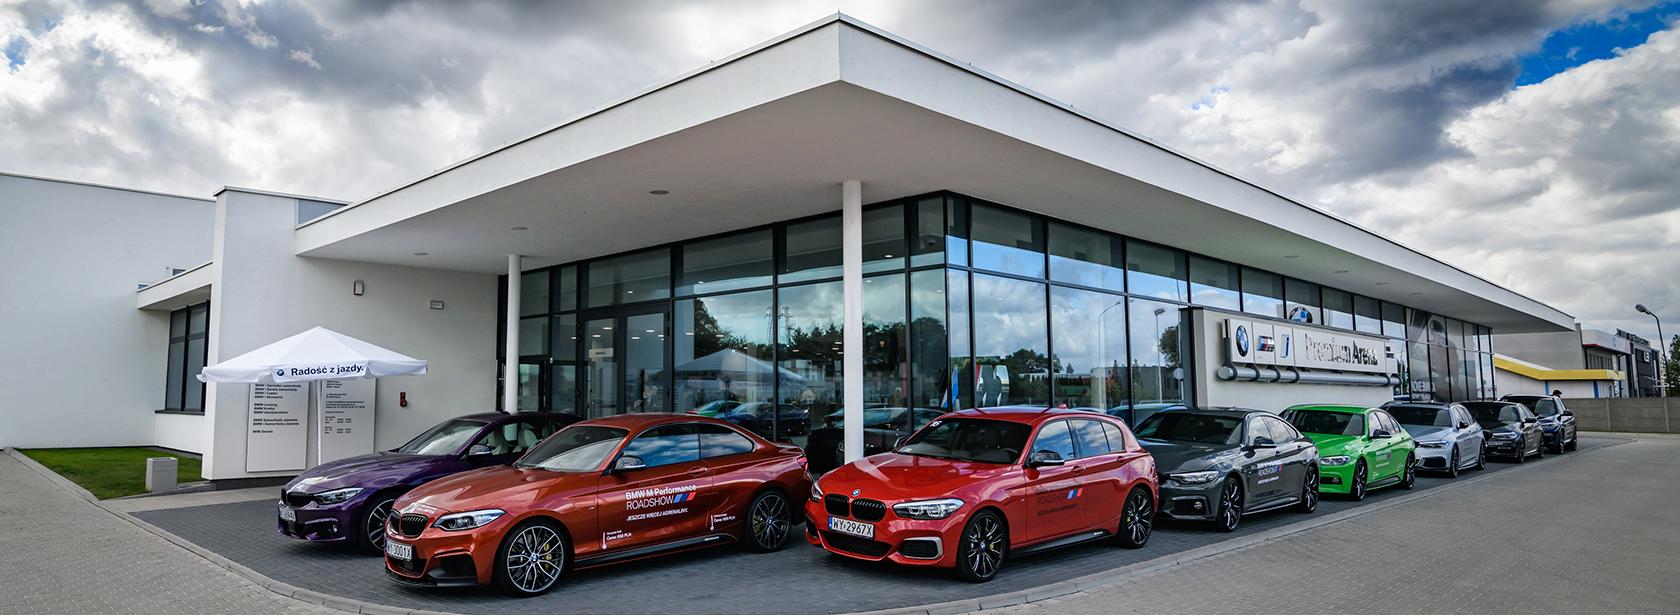 Salon Dealer BMW Premium Arena Kalisz.